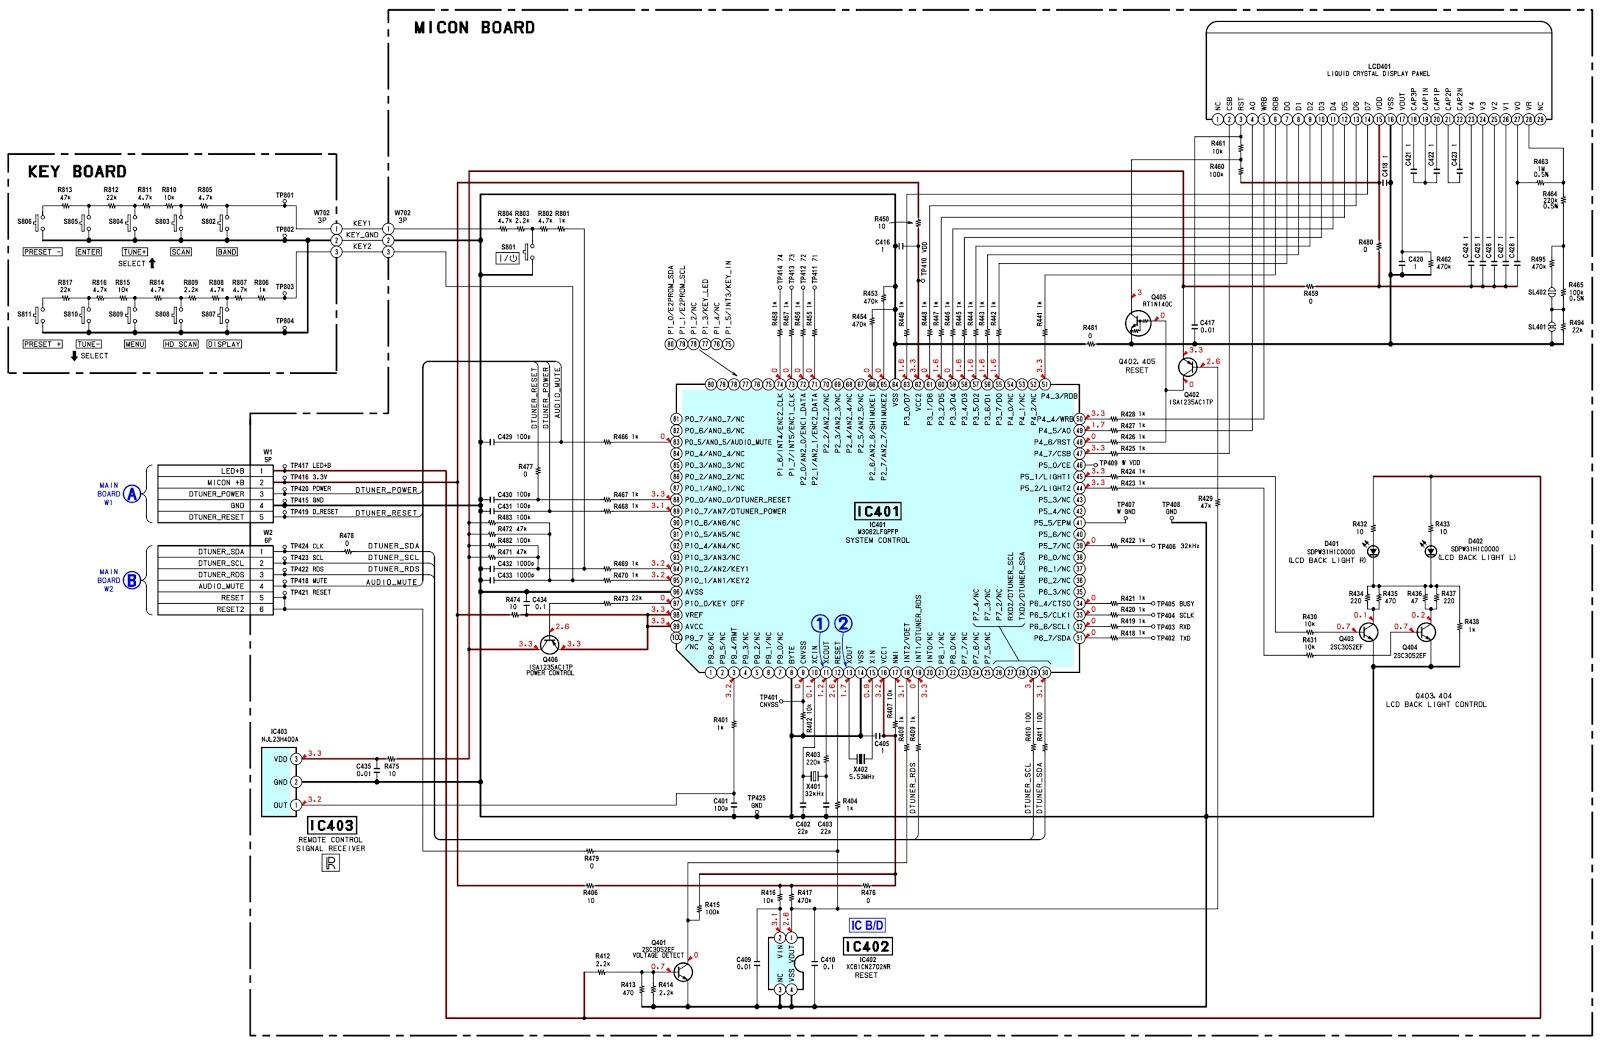 cessna 172 wiring diagram download somurich com cessna 182 diagram cessna 172 wiring diagram download fine cessna 172 wiring diagram images electrical circuit diagram